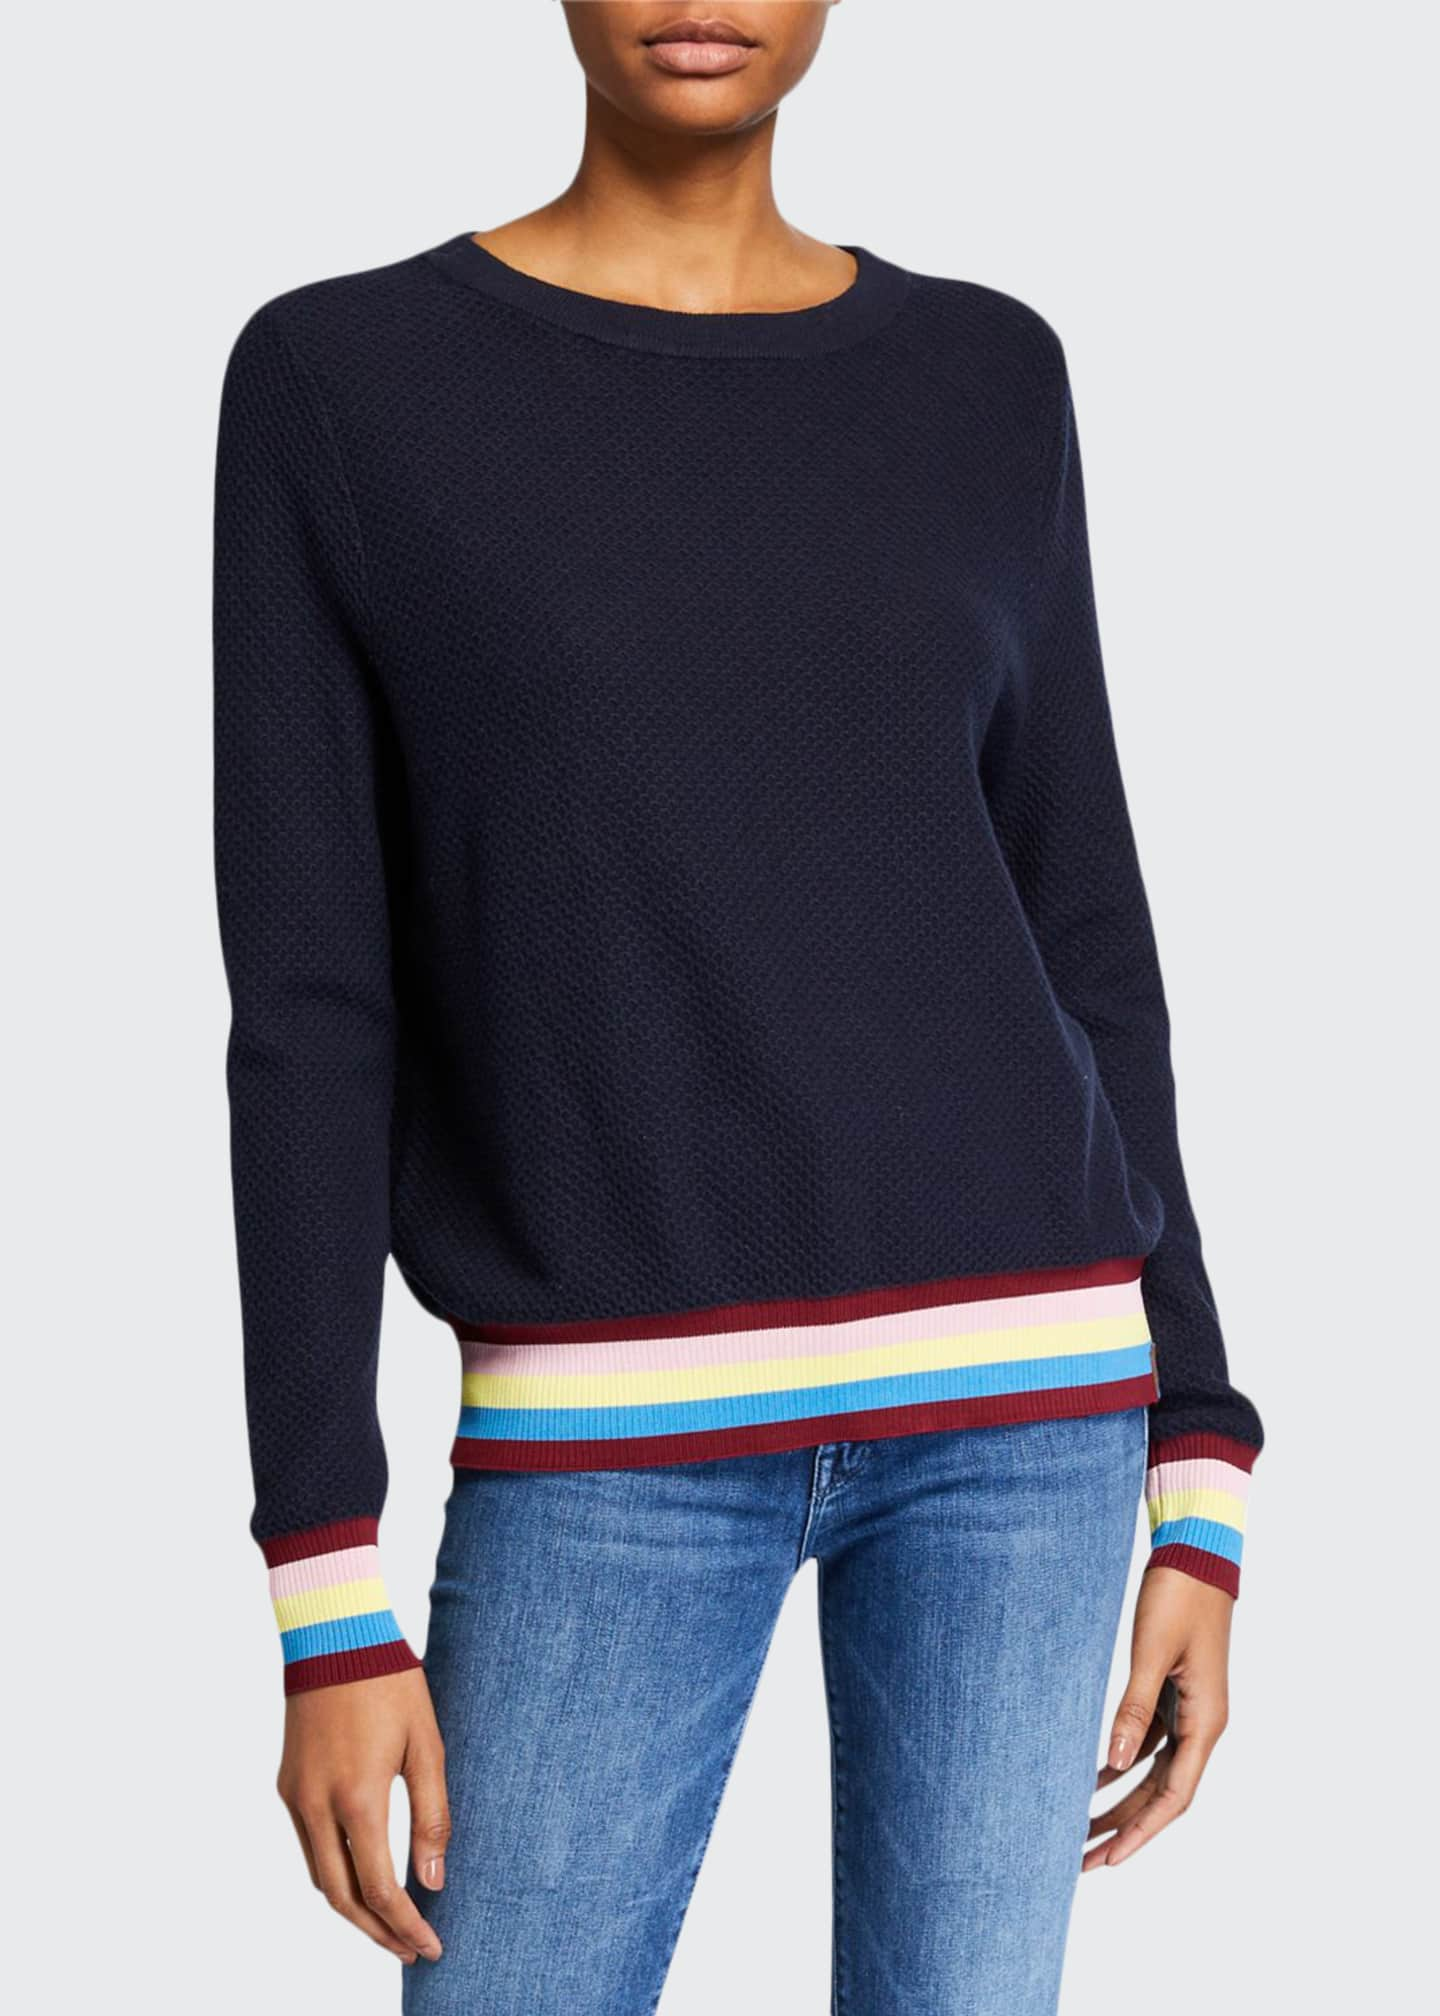 Kule The Fiona Textured Sweater